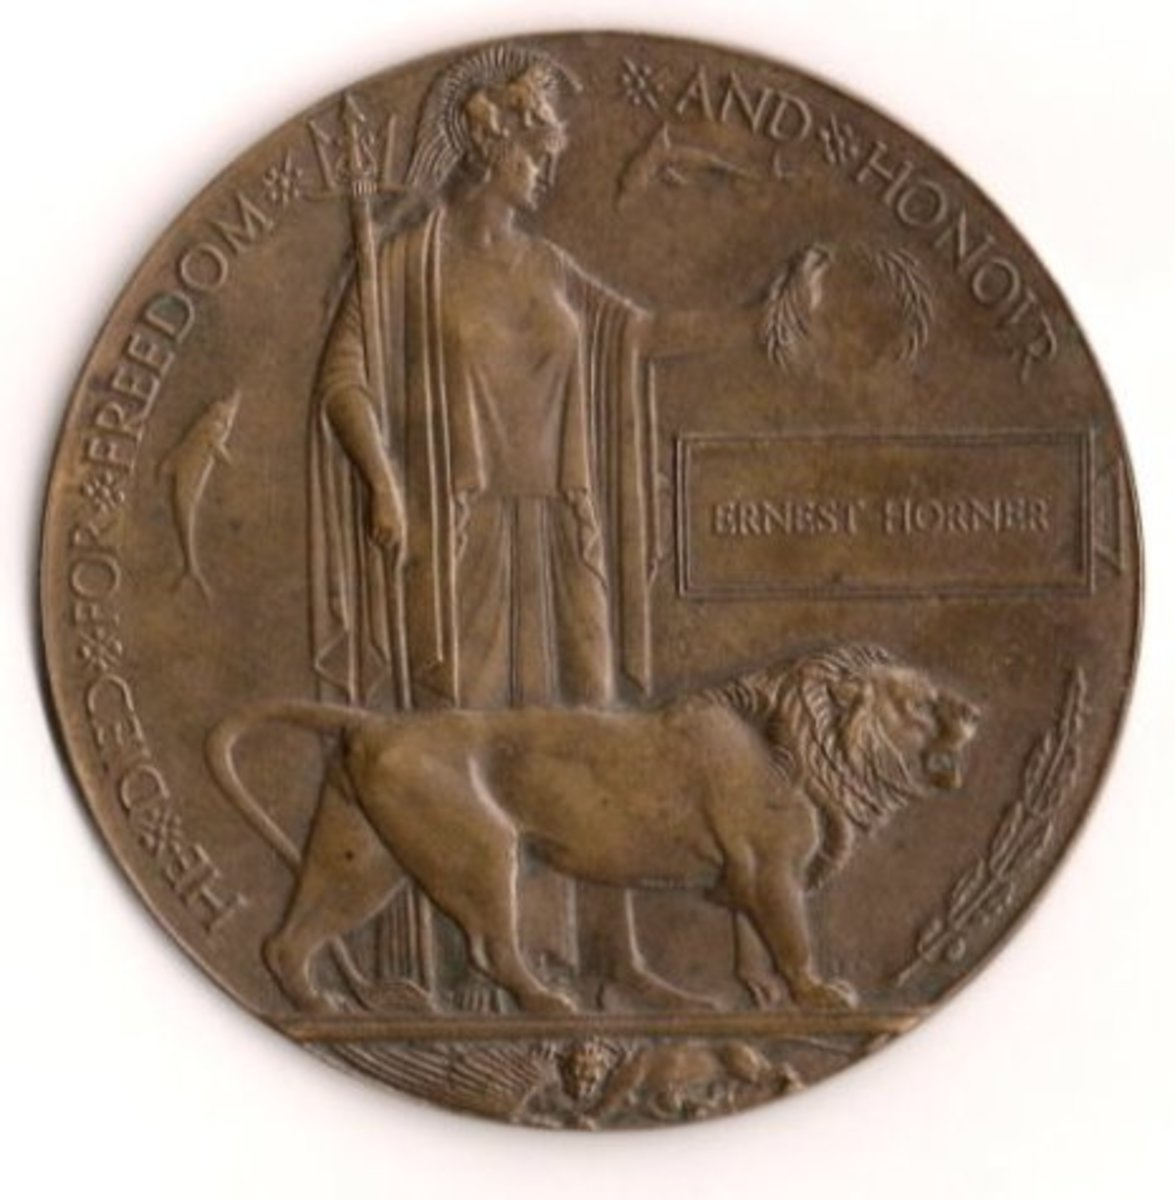 Designed by Edward Carter Preston. ~ Public Domain. - See: http://en.wikipedia.org/wiki/File:Memorial_Plaque.jpg